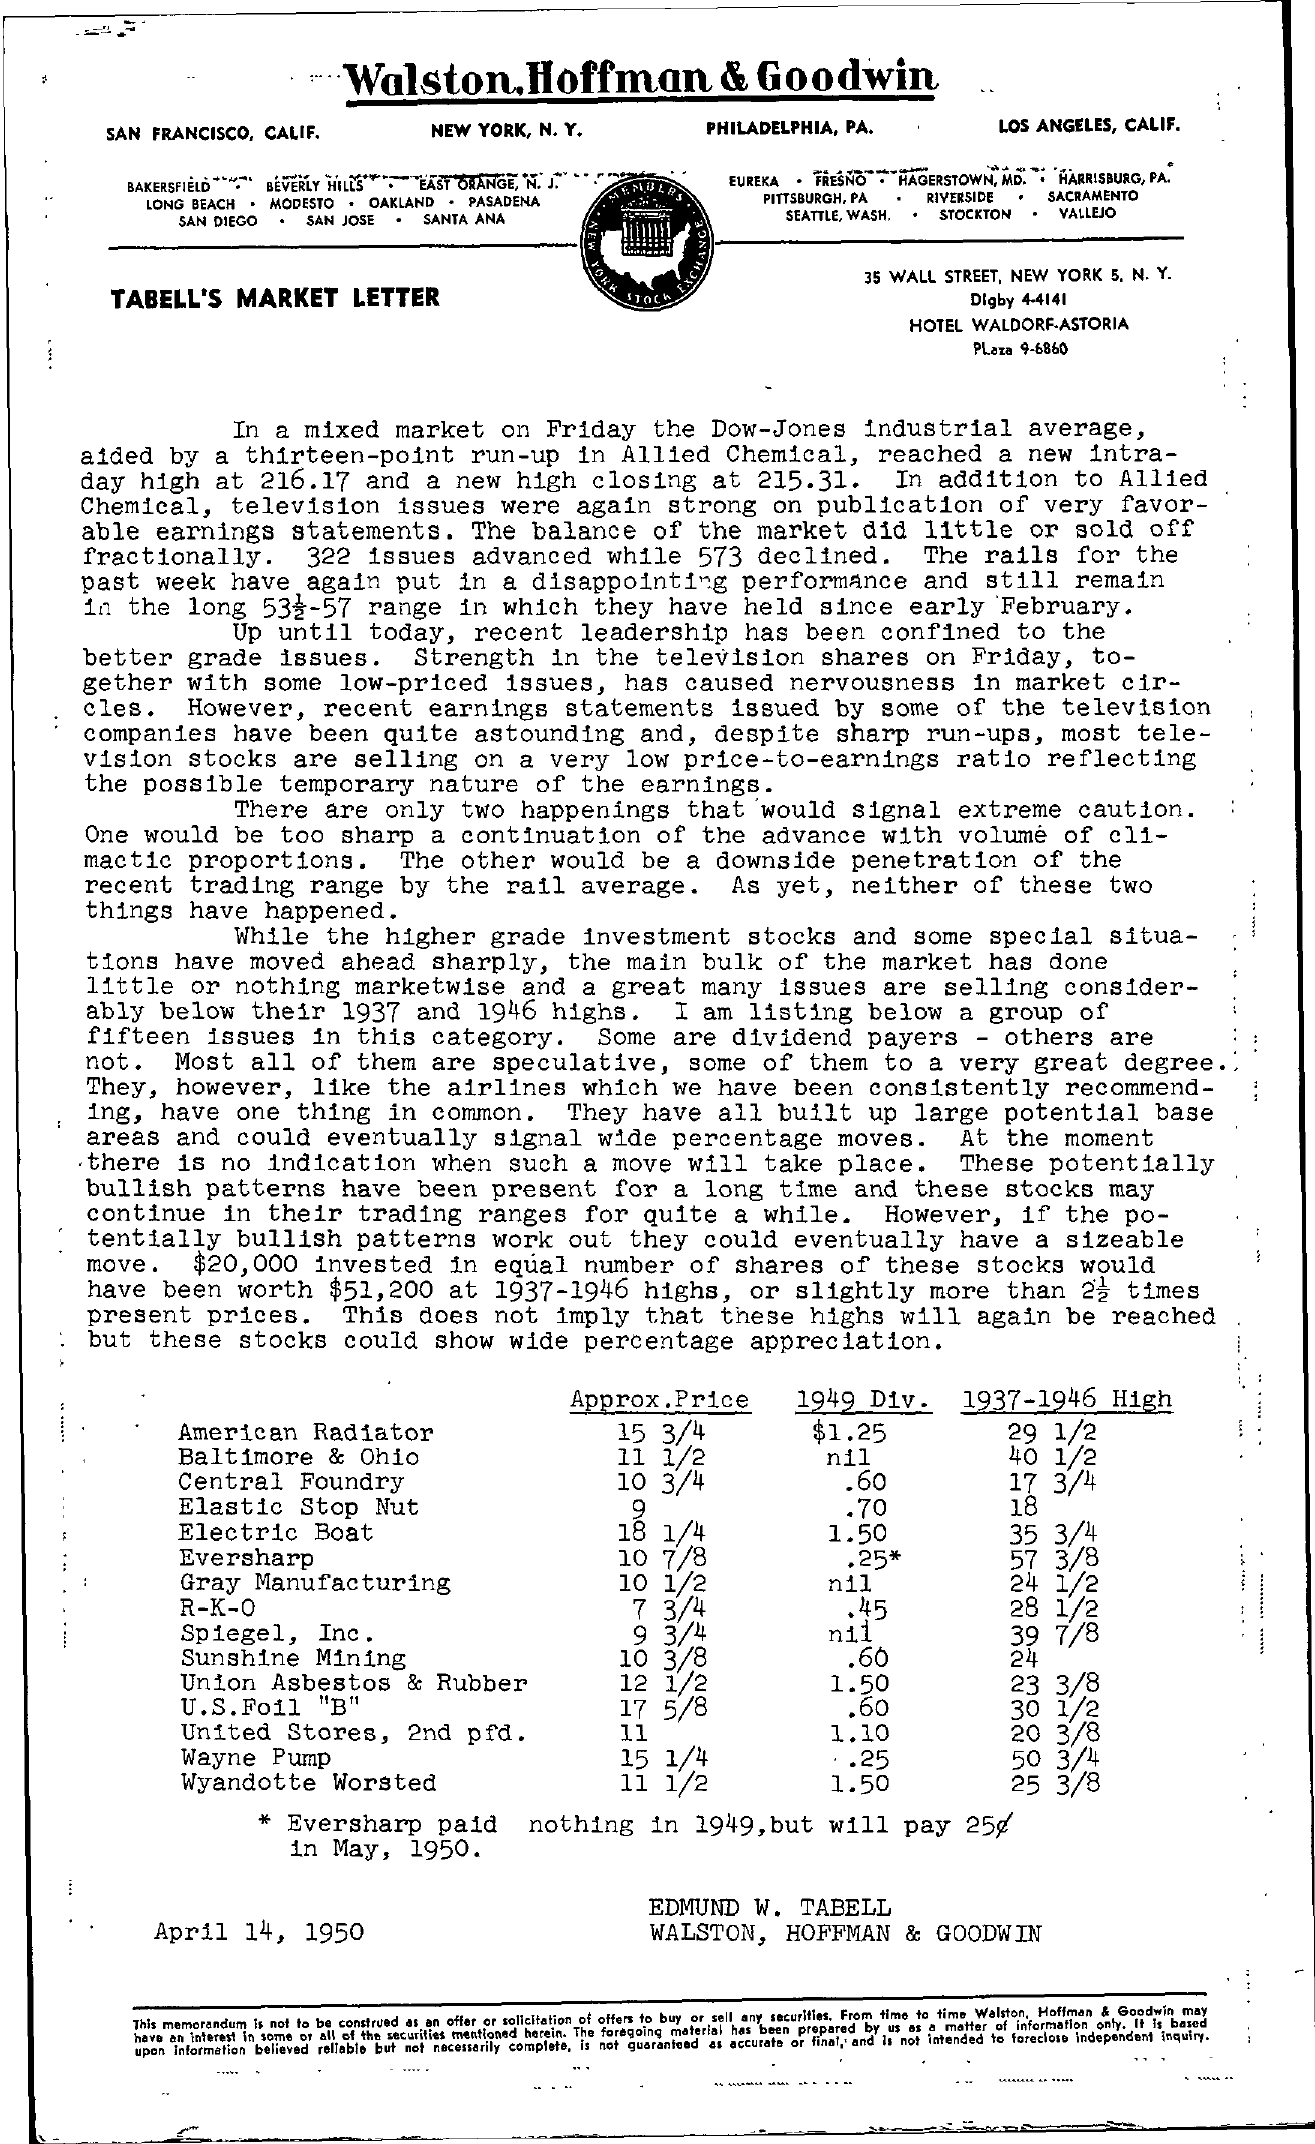 Tabell's Market Letter - April 14, 1950